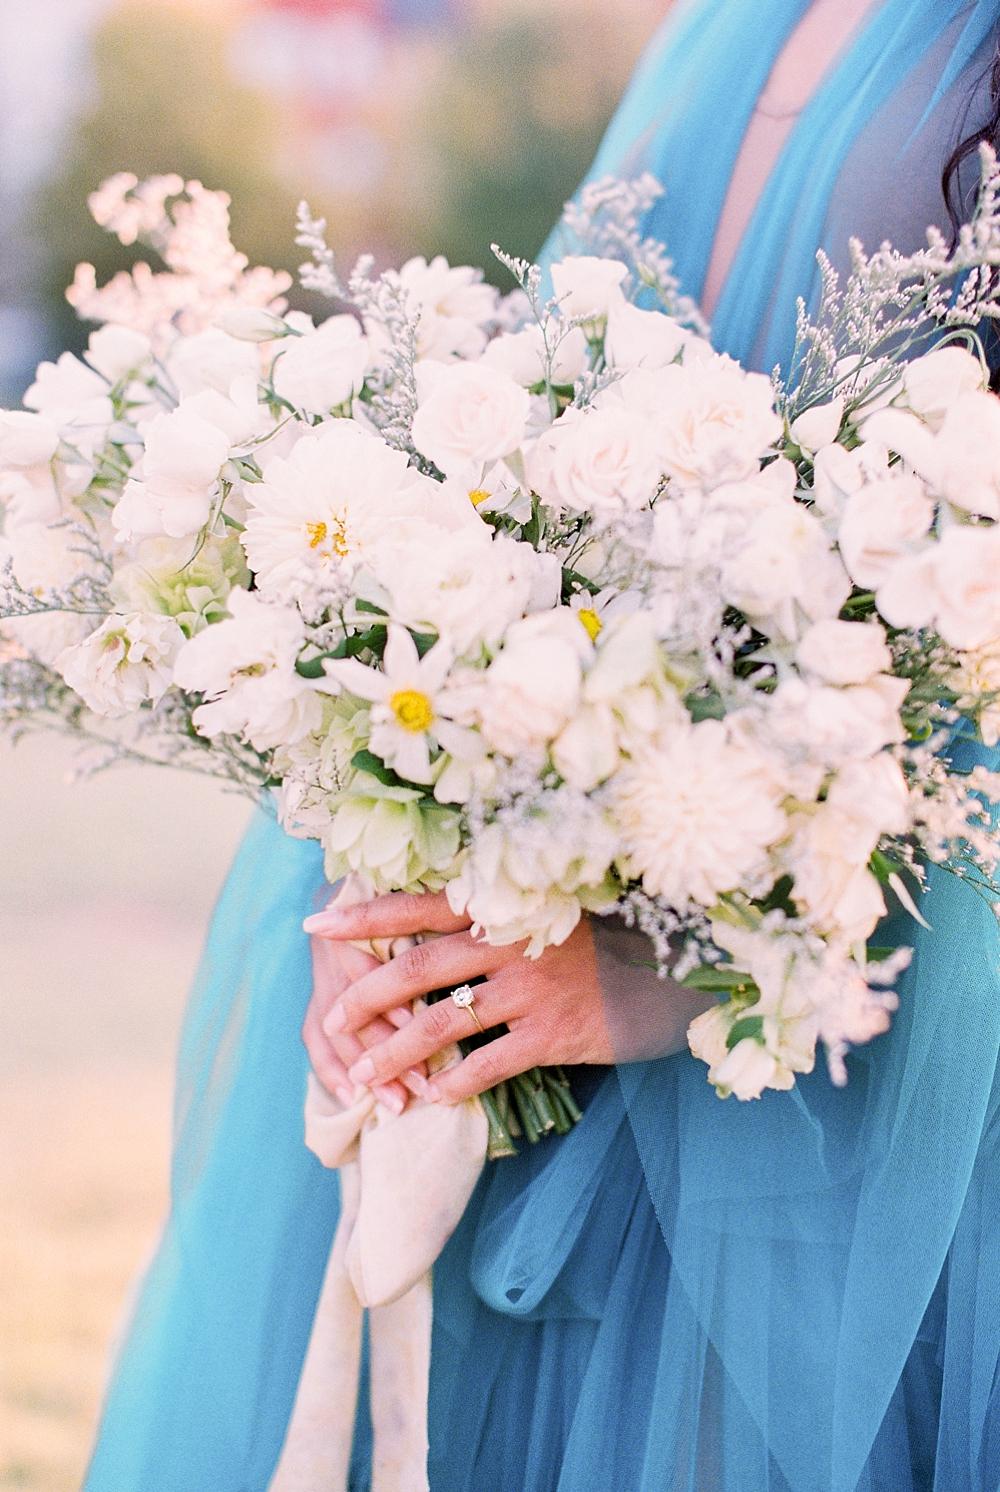 kristin-la-voie-photography-AUSTIN-wedding-BOUDOIR-photographer-55